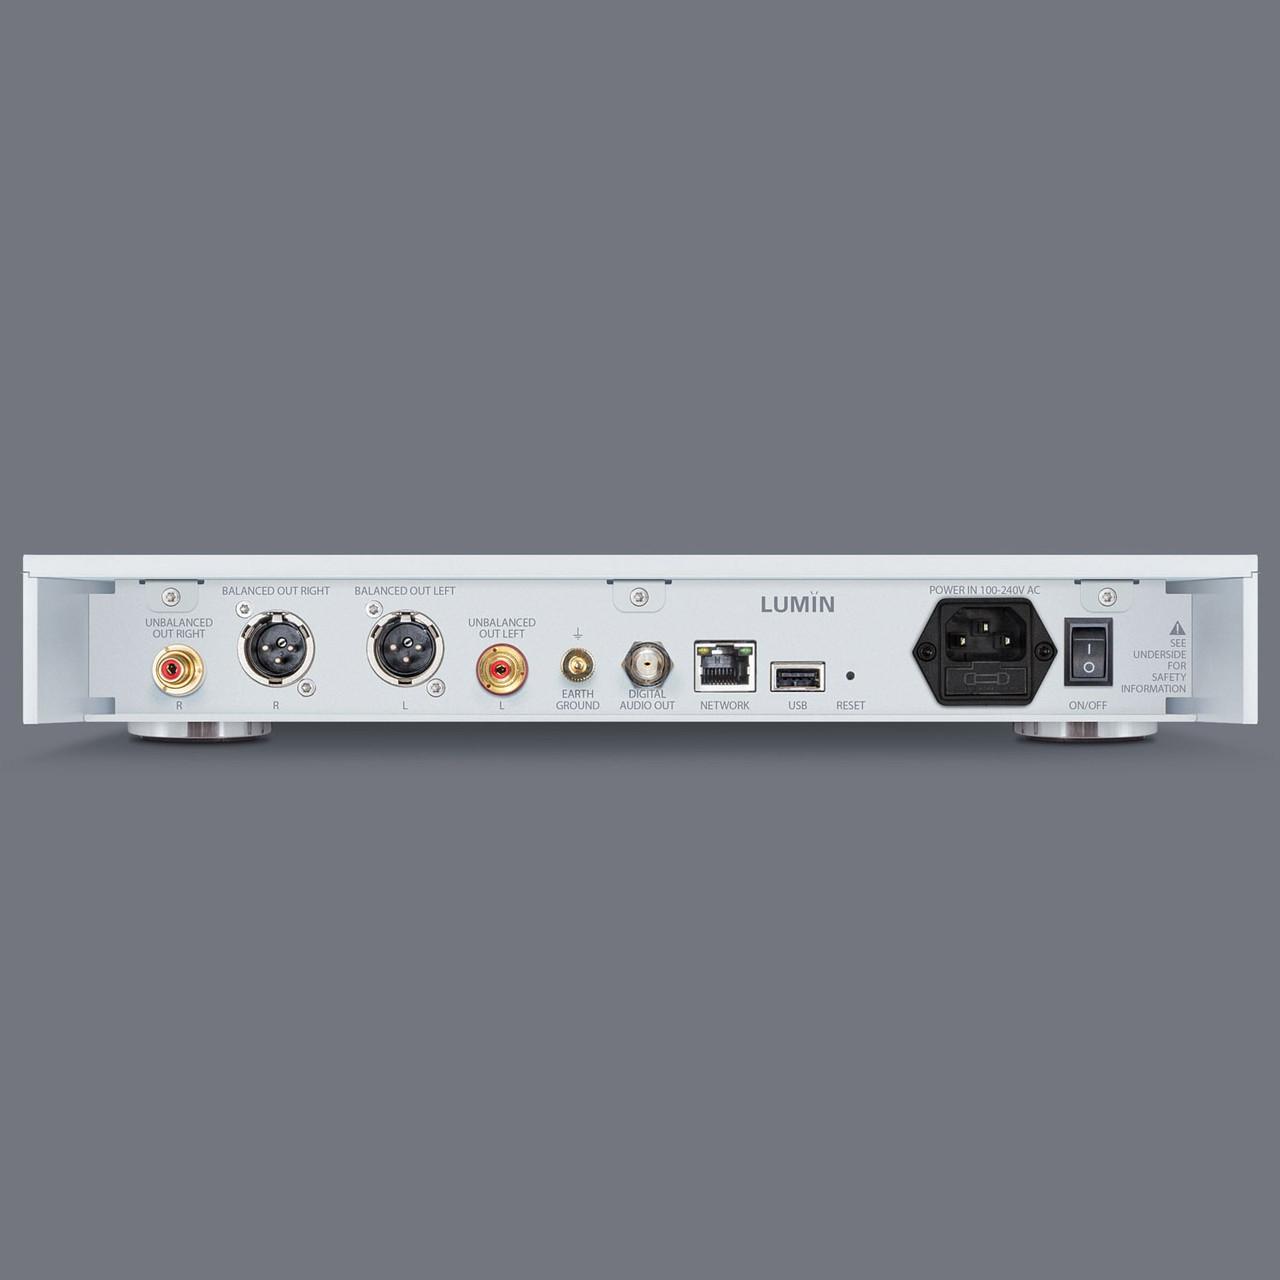 Lumin T2 network music streamer